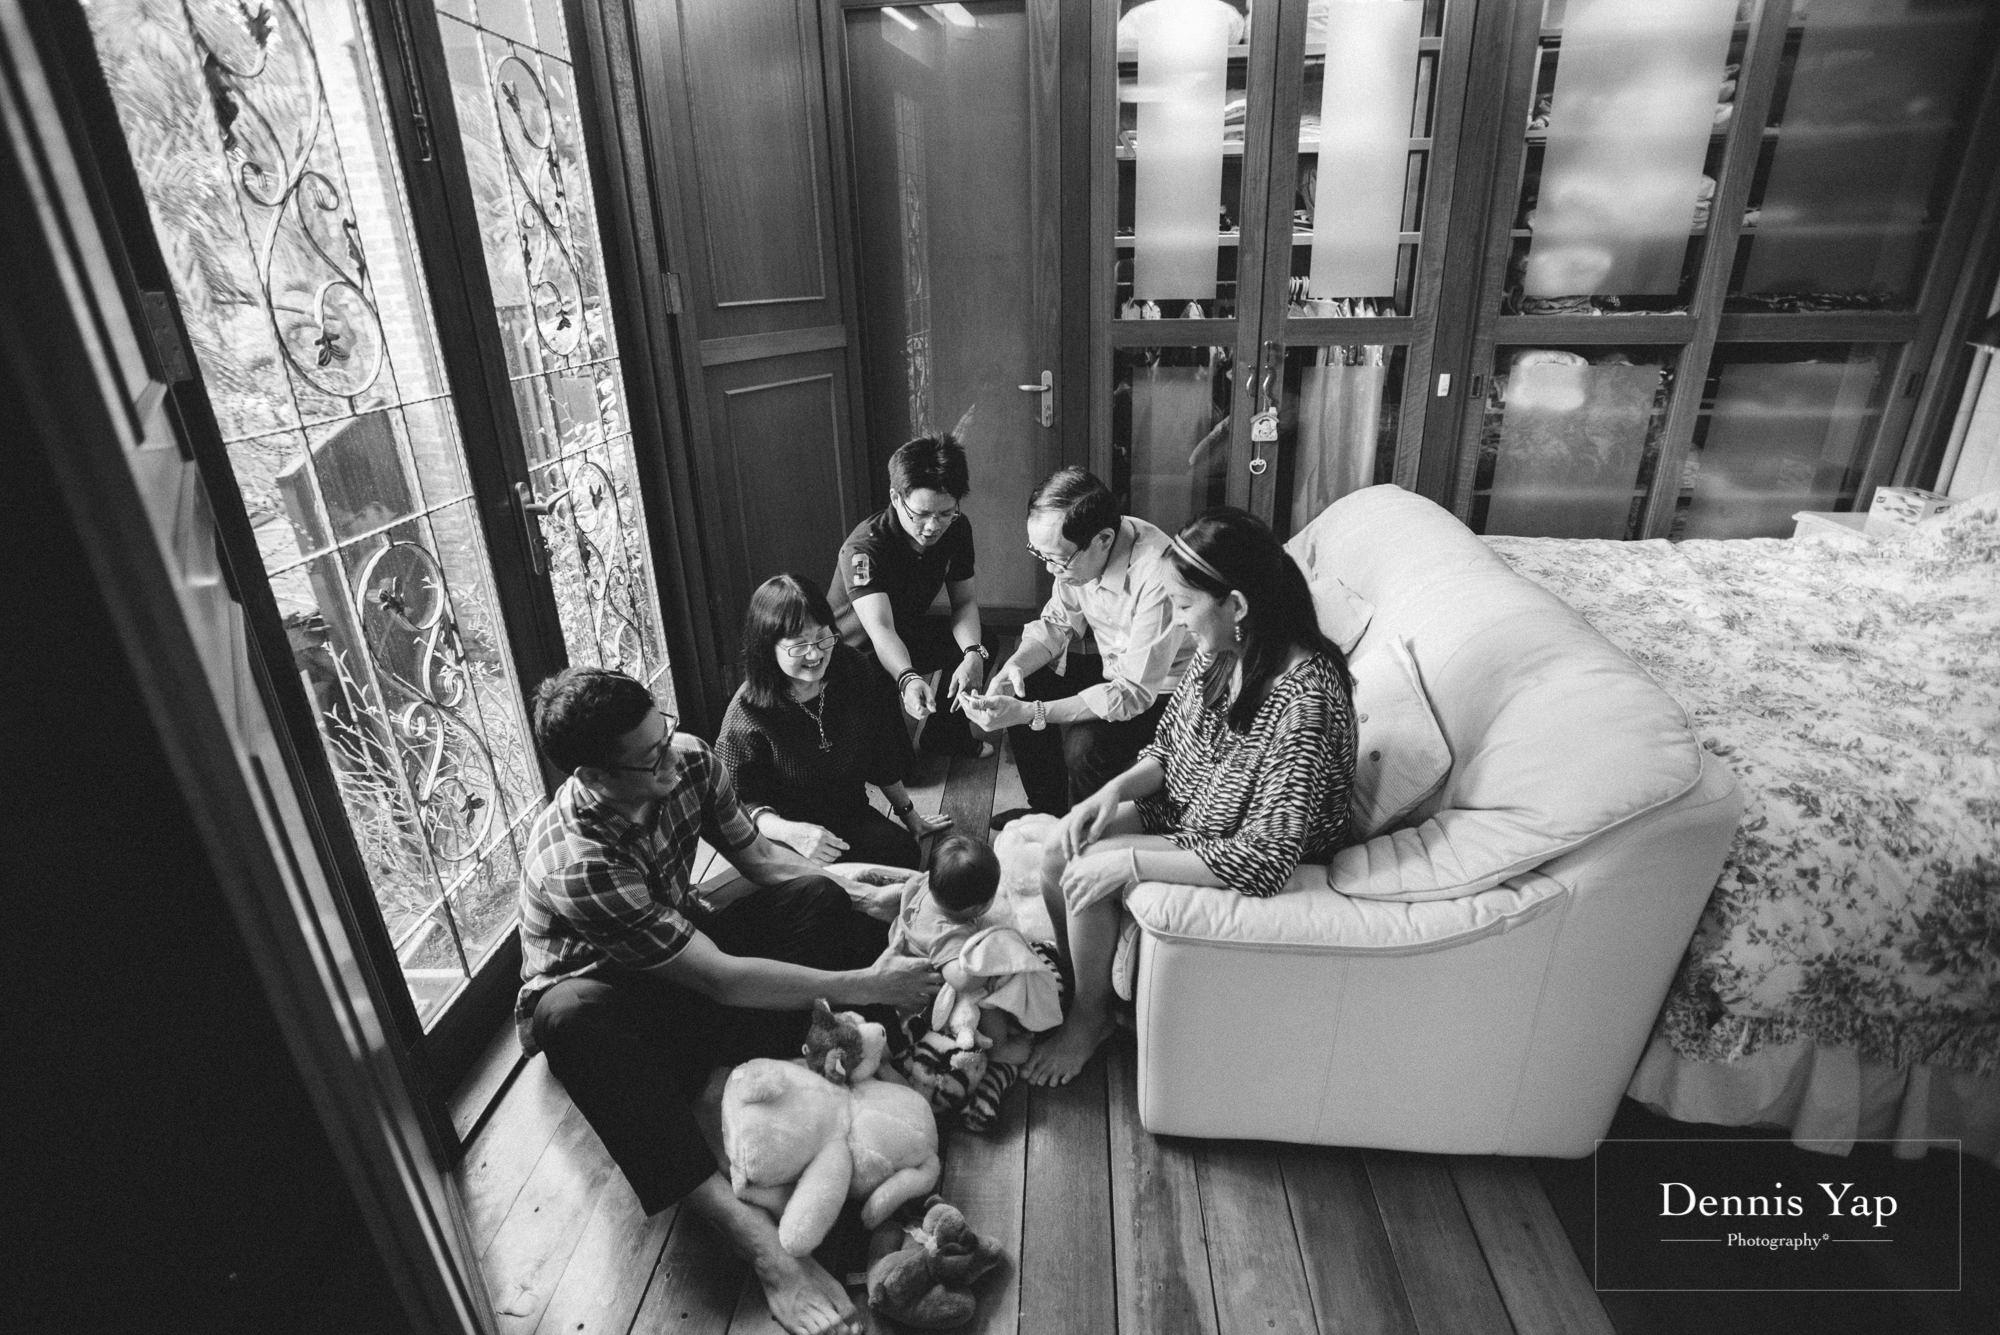 thong family chuen thong portrait beloved dennis yap photography-12.jpg